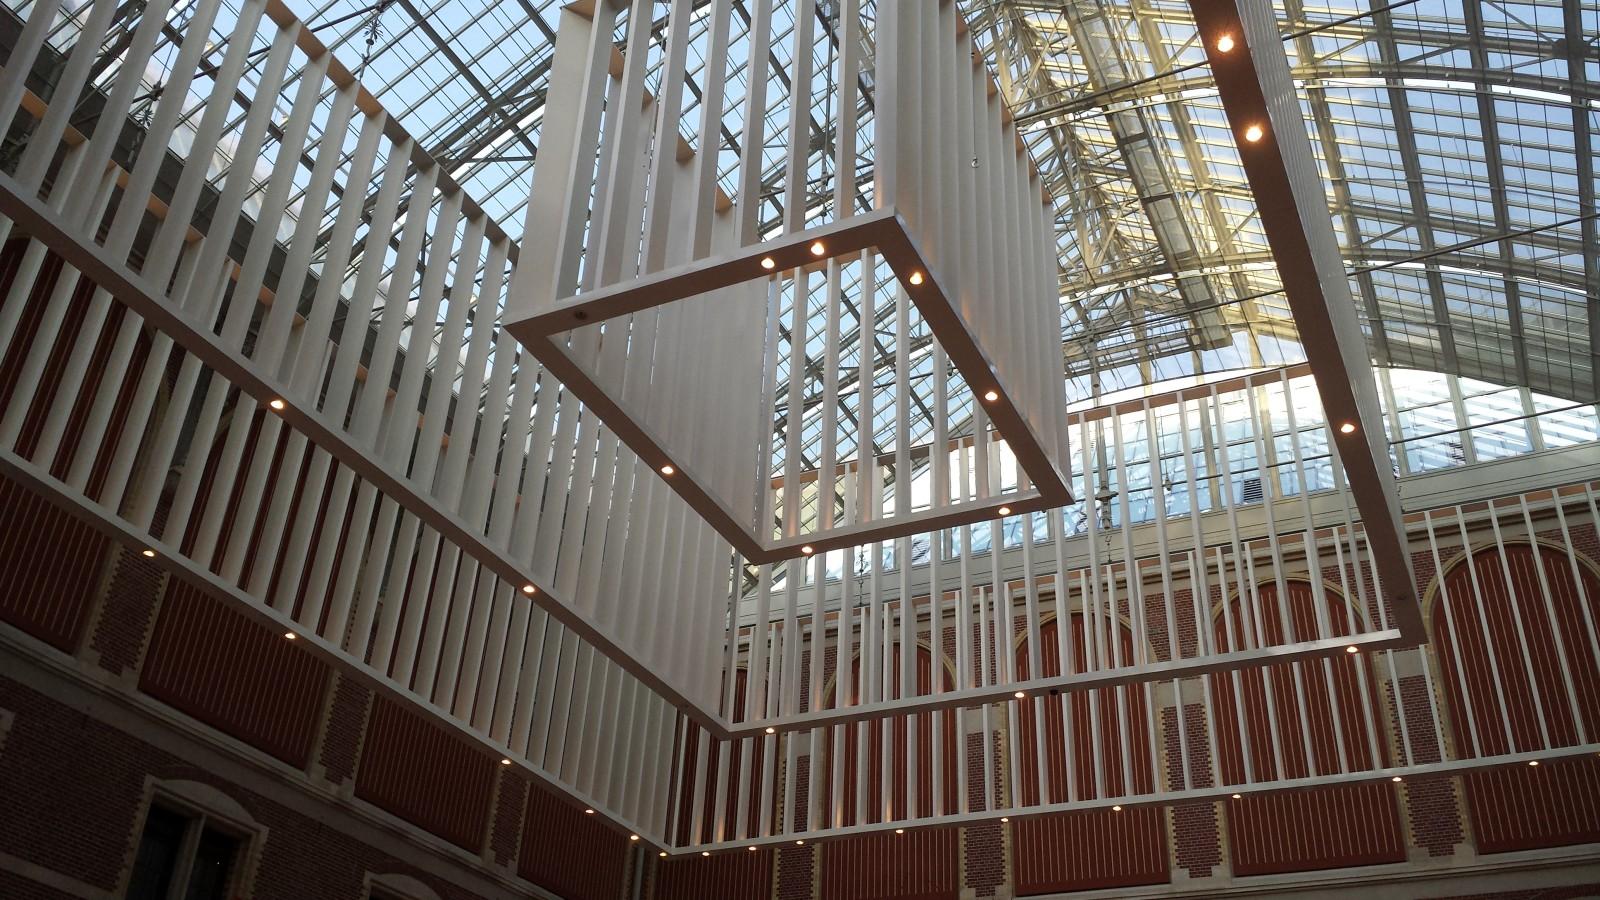 20141003_091616 Rijksmuseum